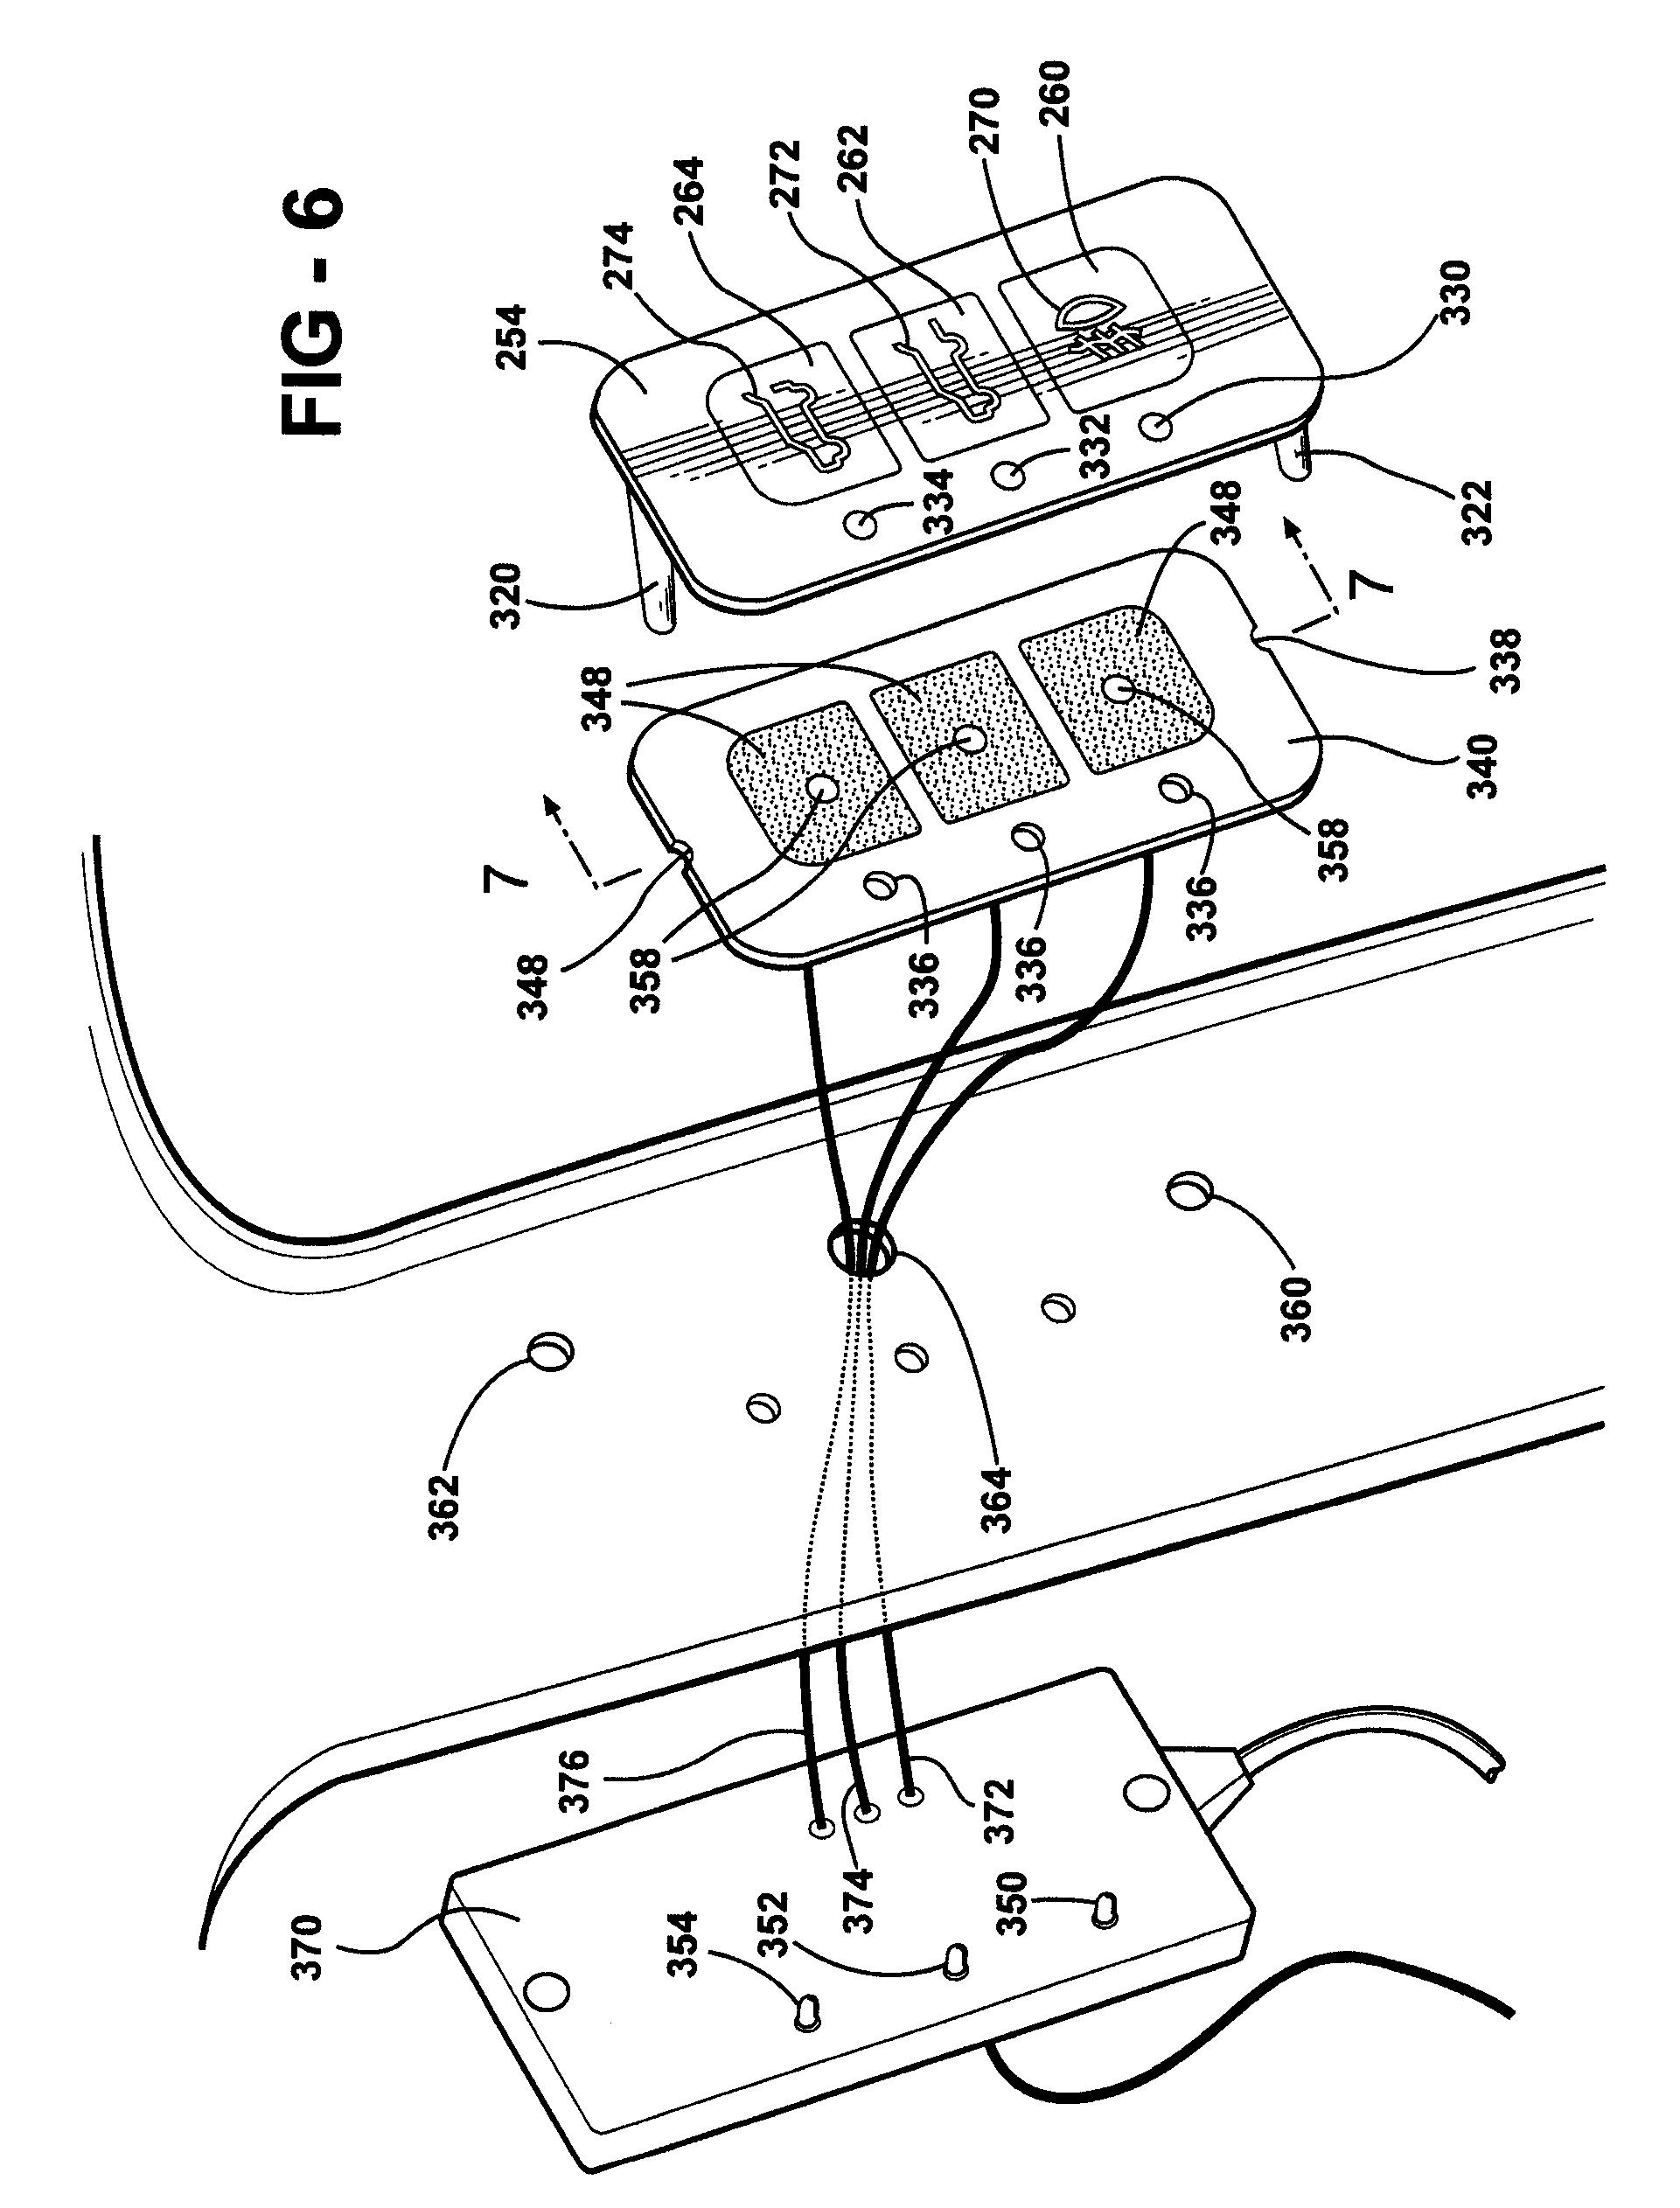 npn proximity sensor circuit diagram